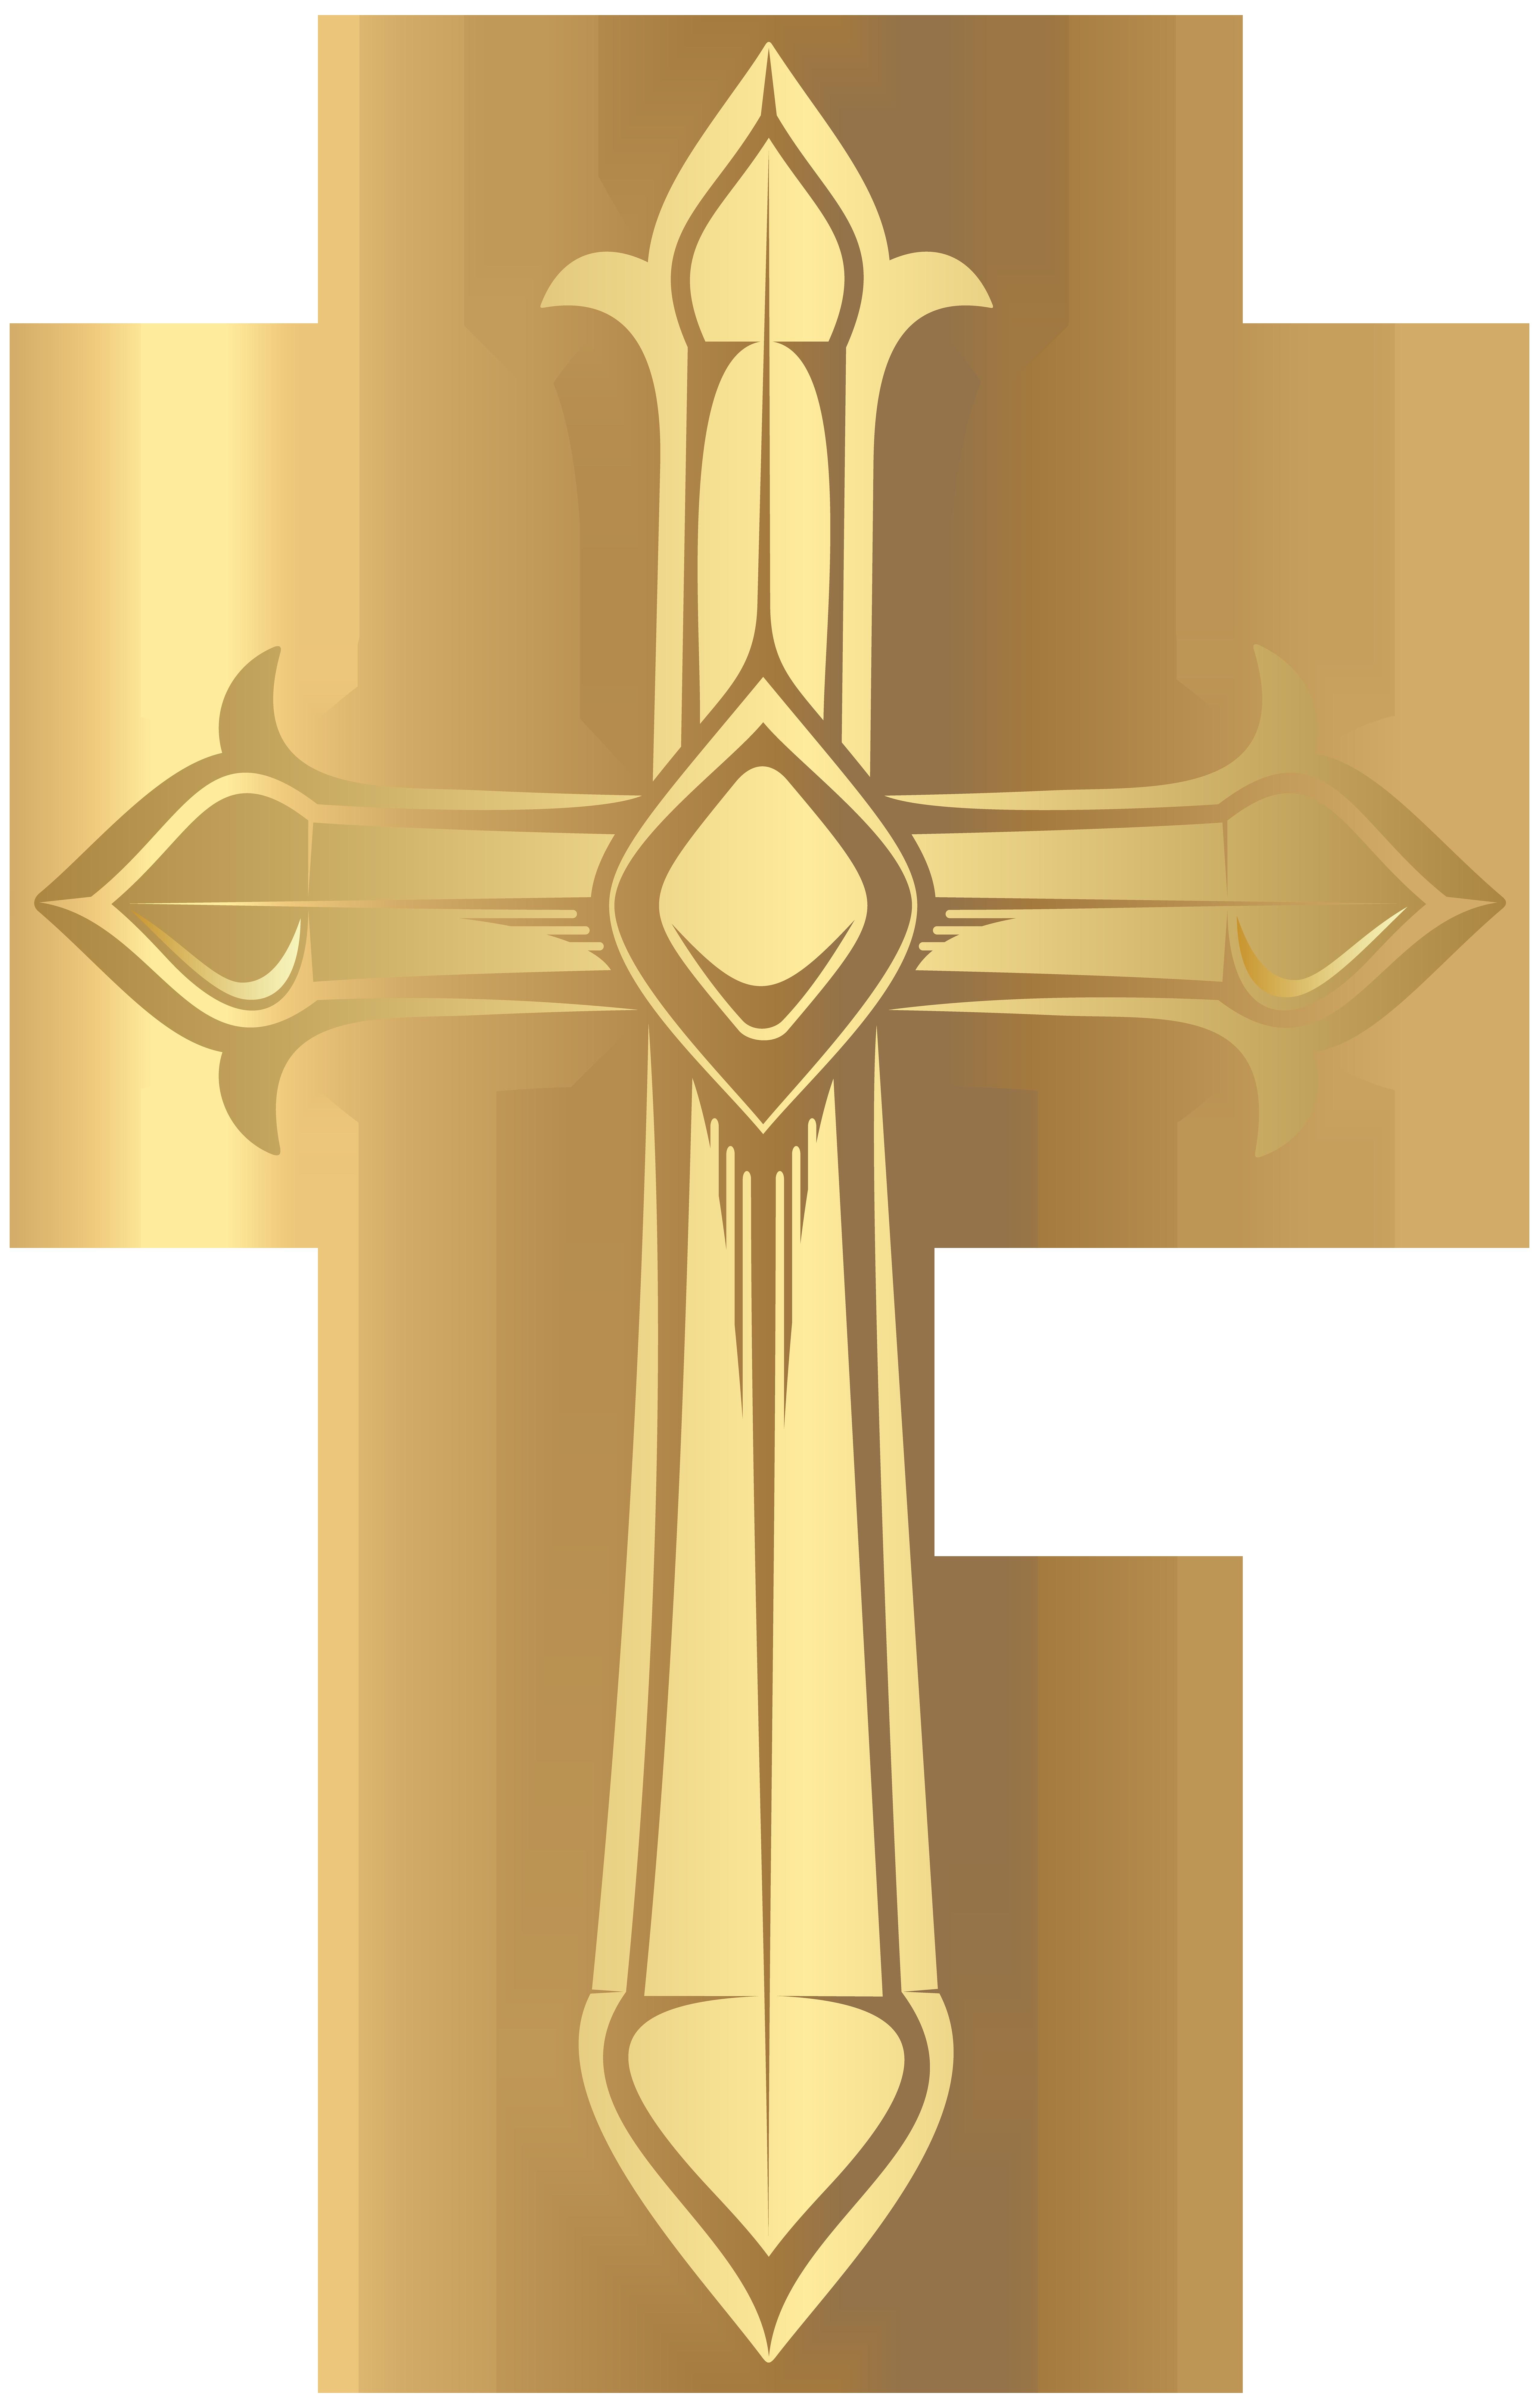 Cross Transparent Png Image High Quality Cruces De Oro Cruz De Cristo Rosa Y Oro